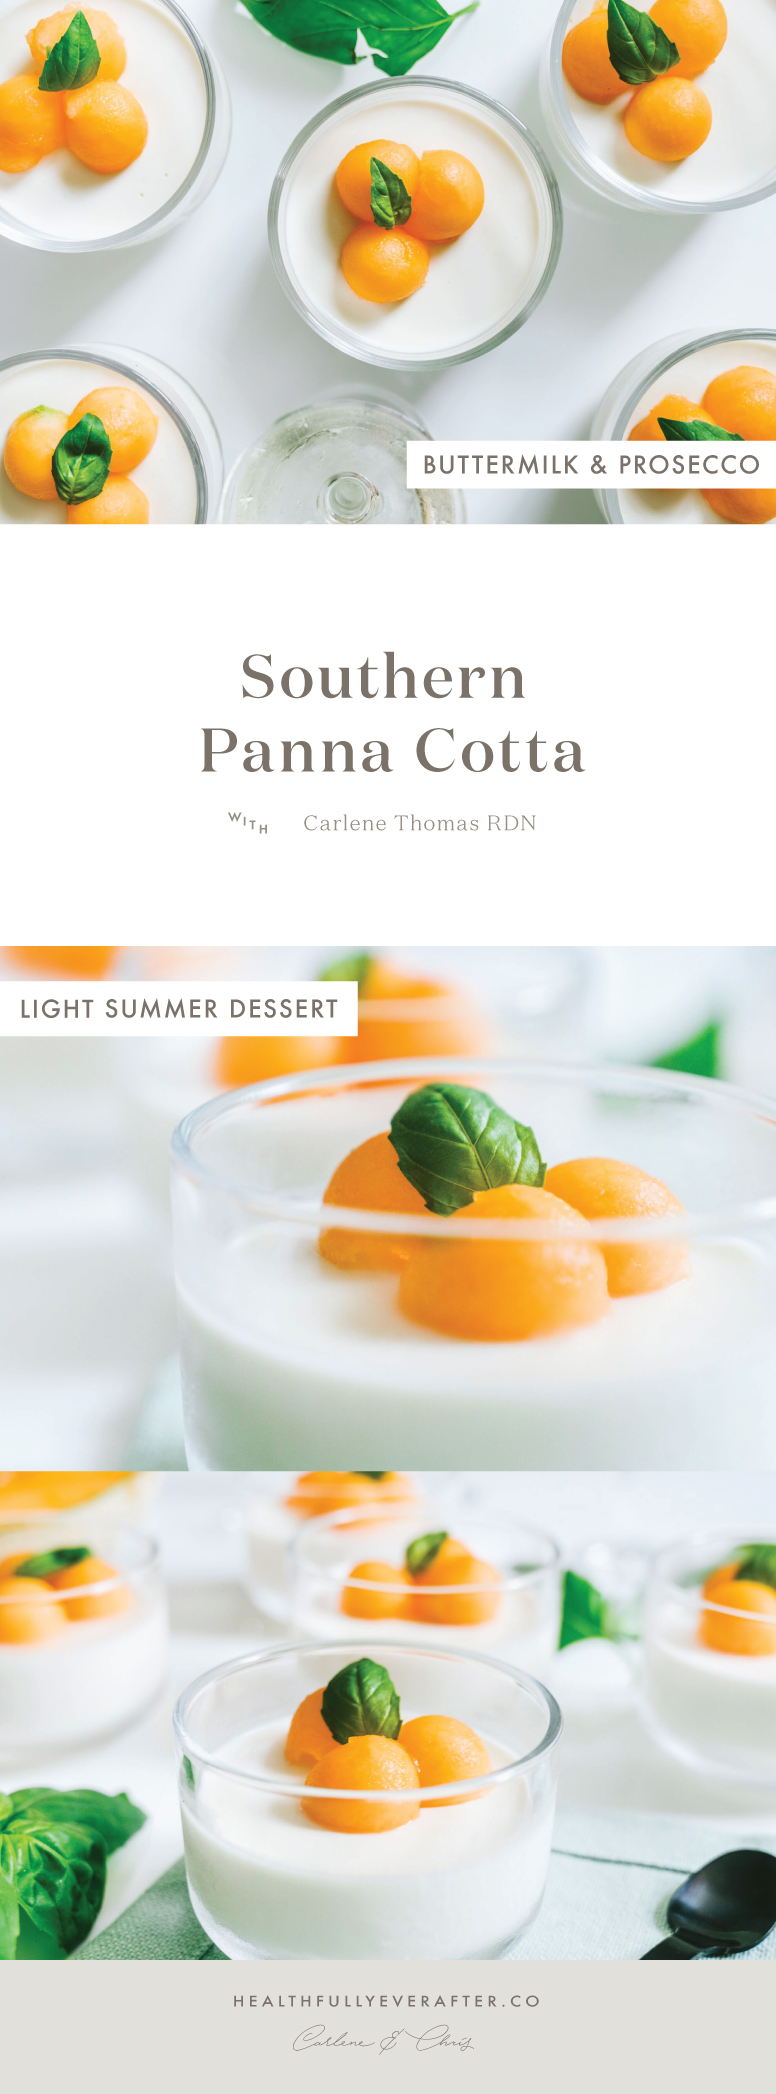 southern cantaloupe panna cotta summer dessert